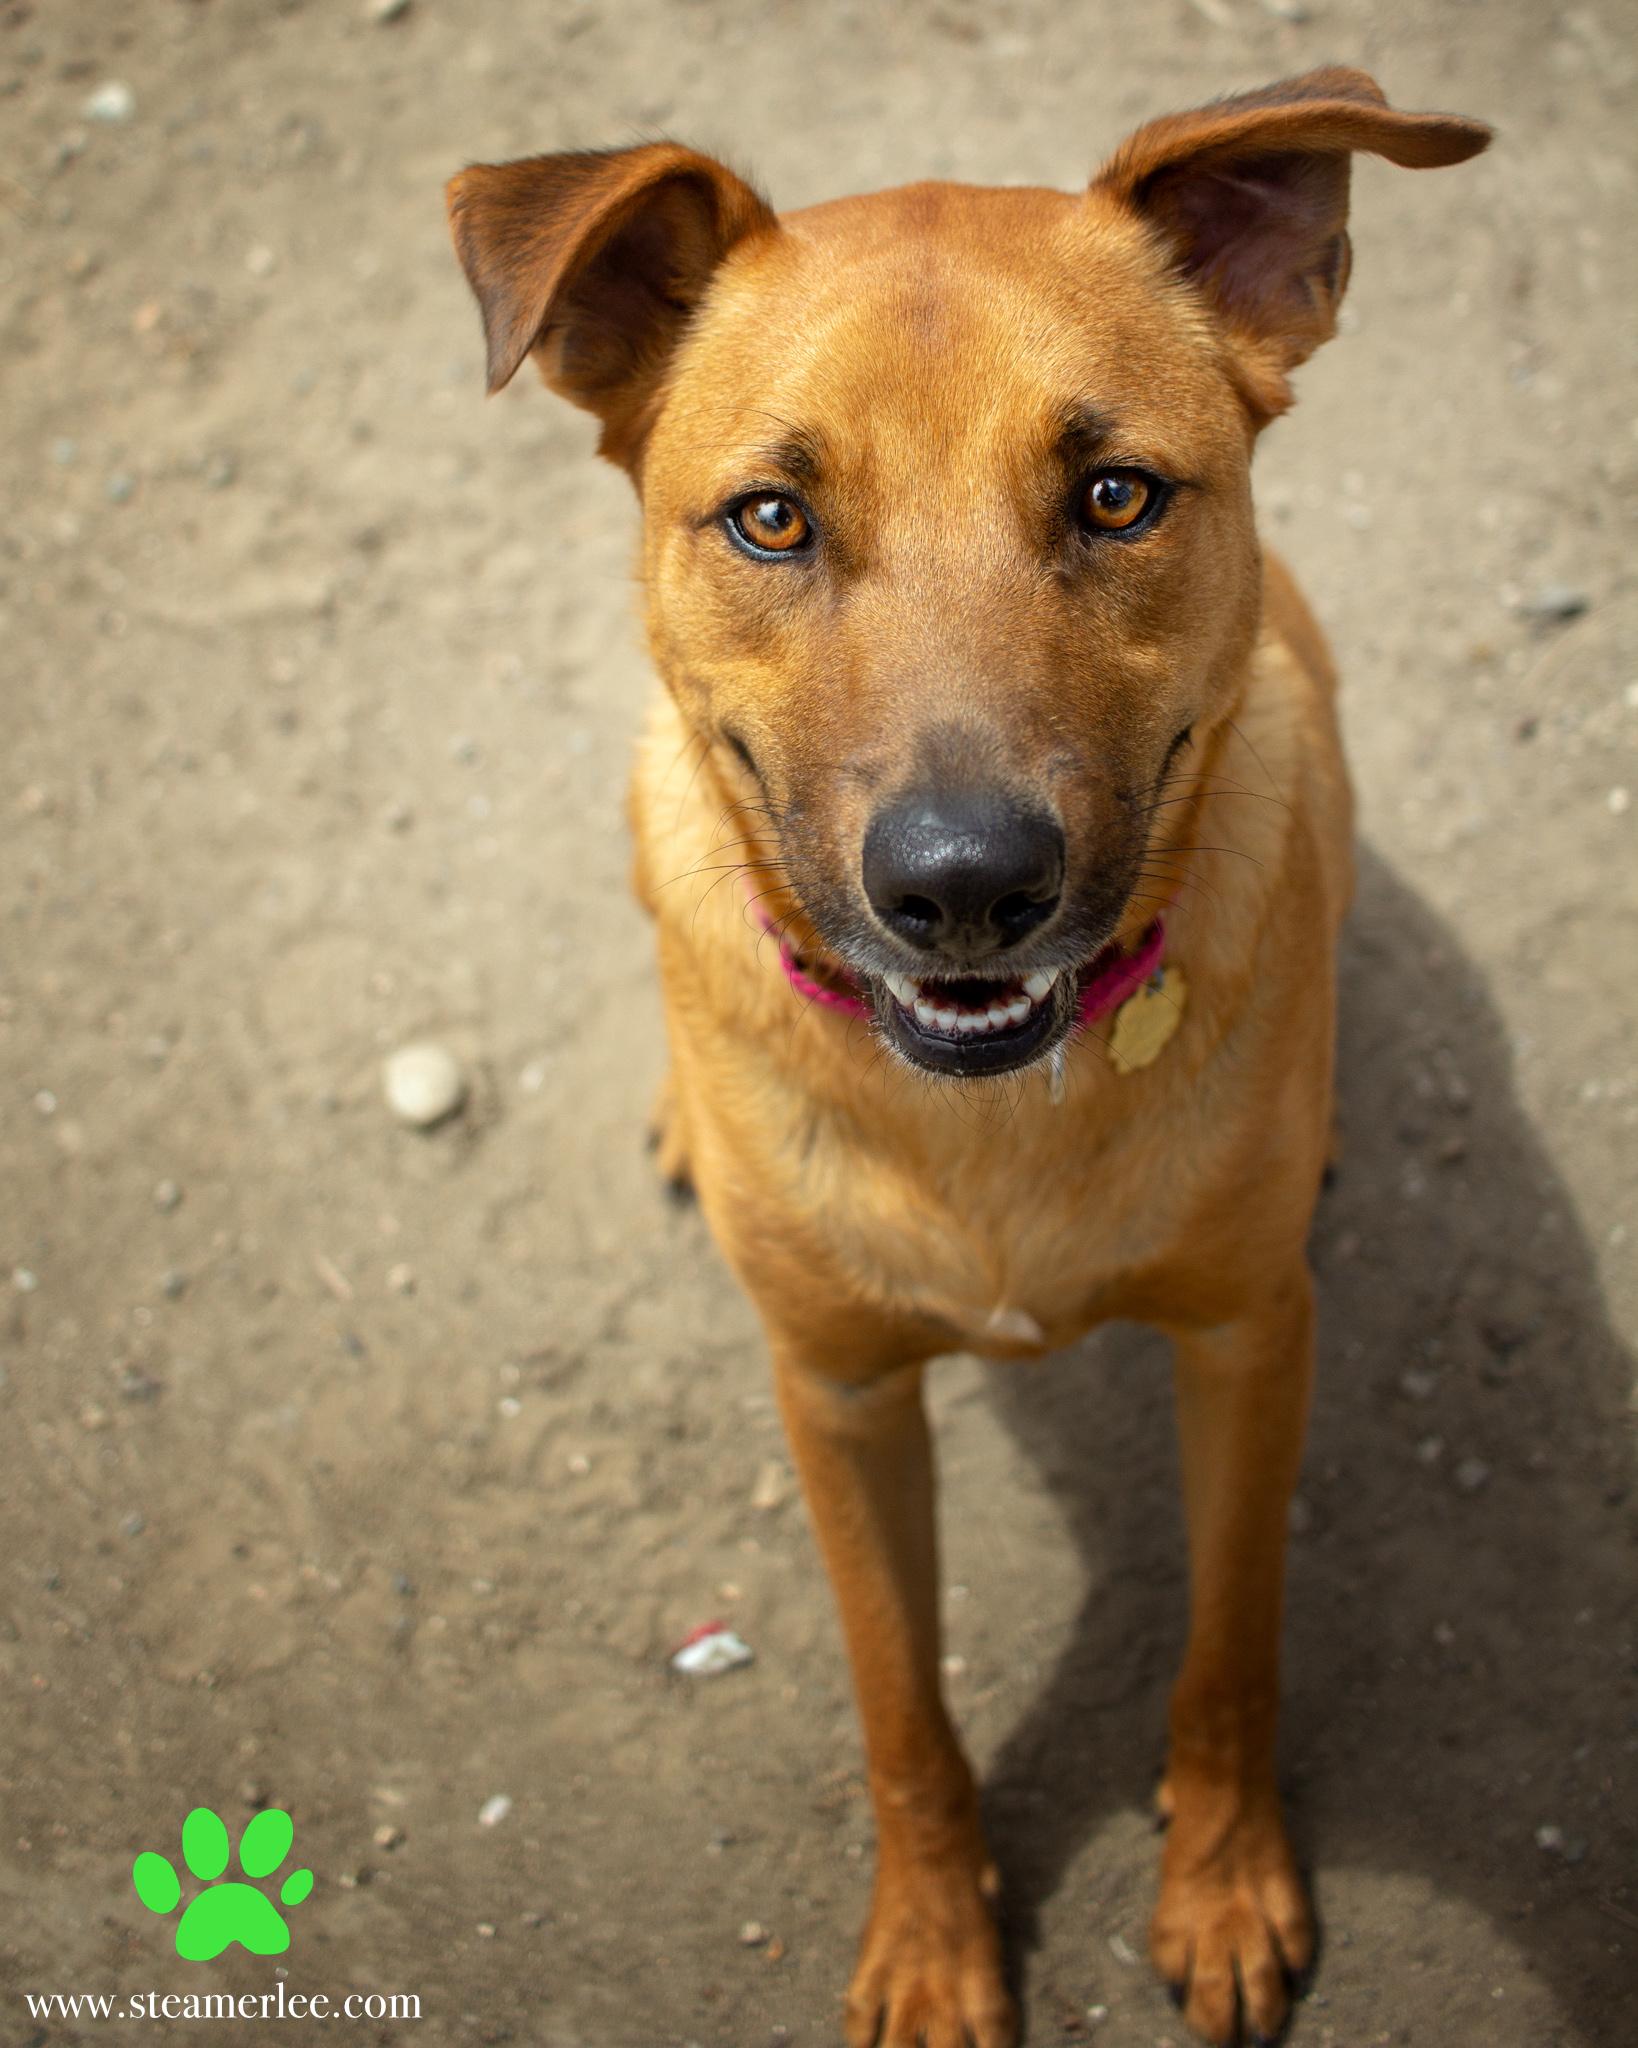 401-Orange-County-Dog-Photography-Steamer-Lee-Southern-California-SBACC.JPG